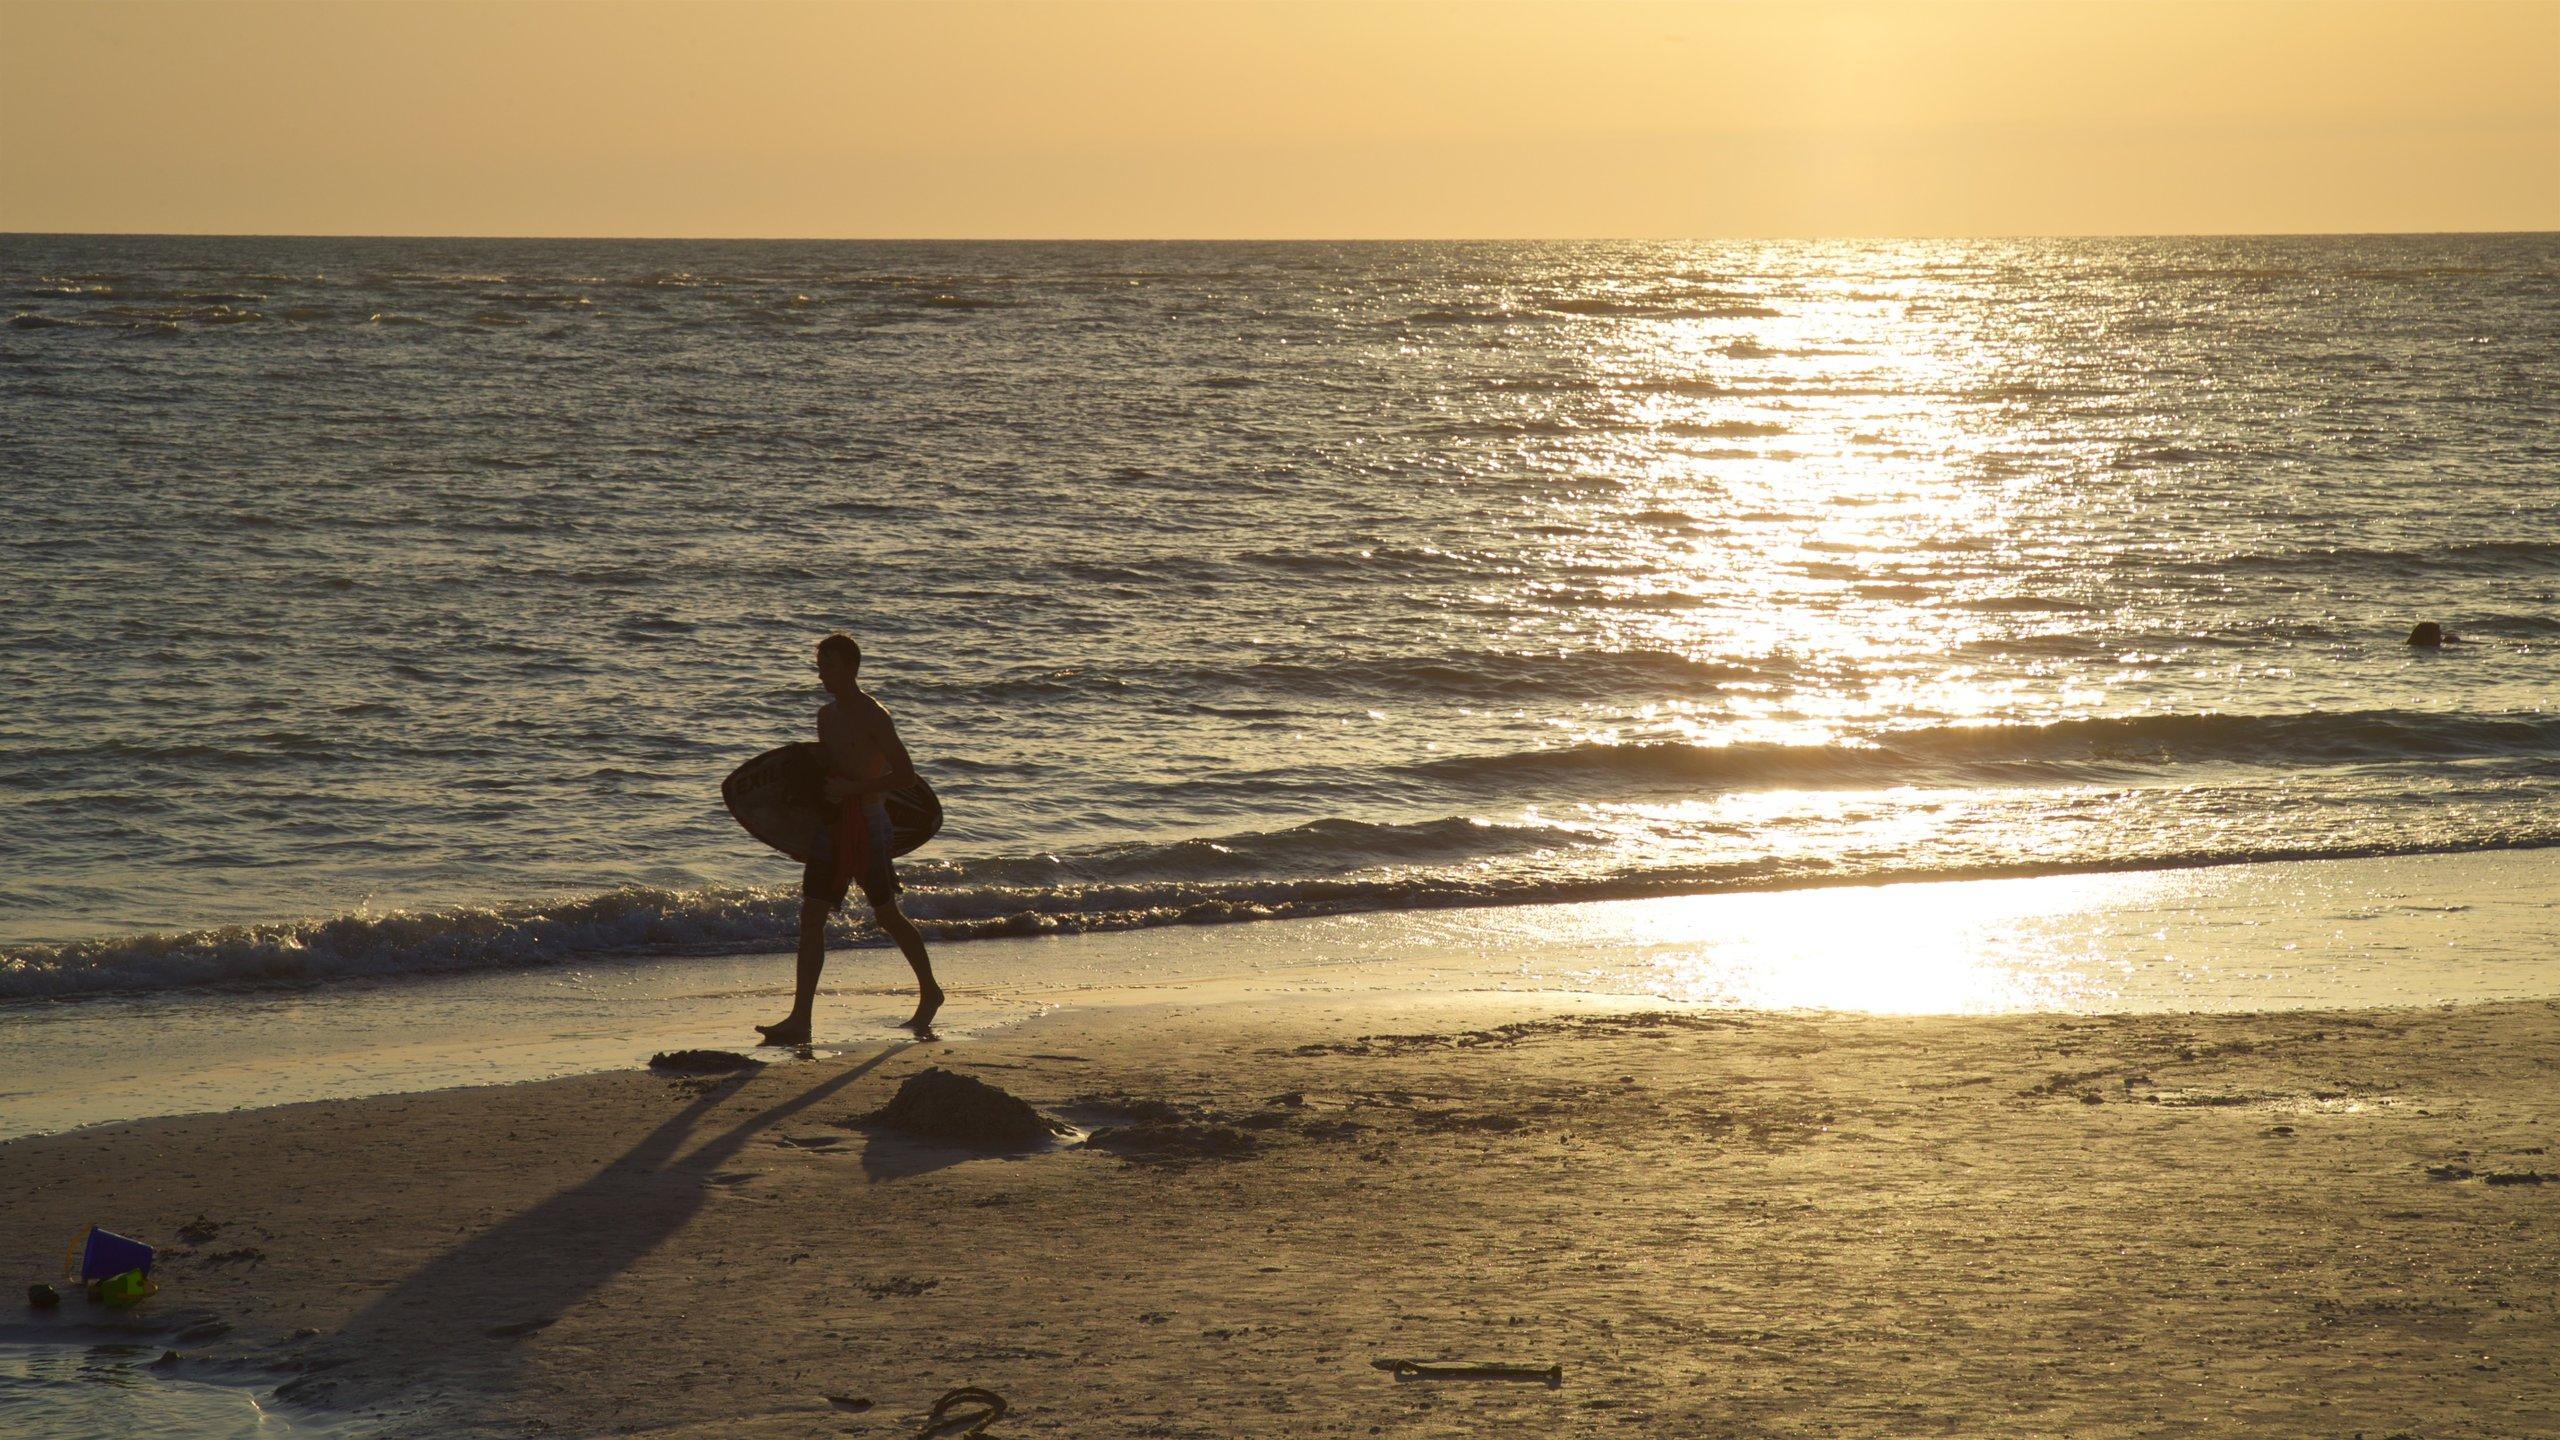 Upham Beach, St. Pete Beach, Florida, United States of America